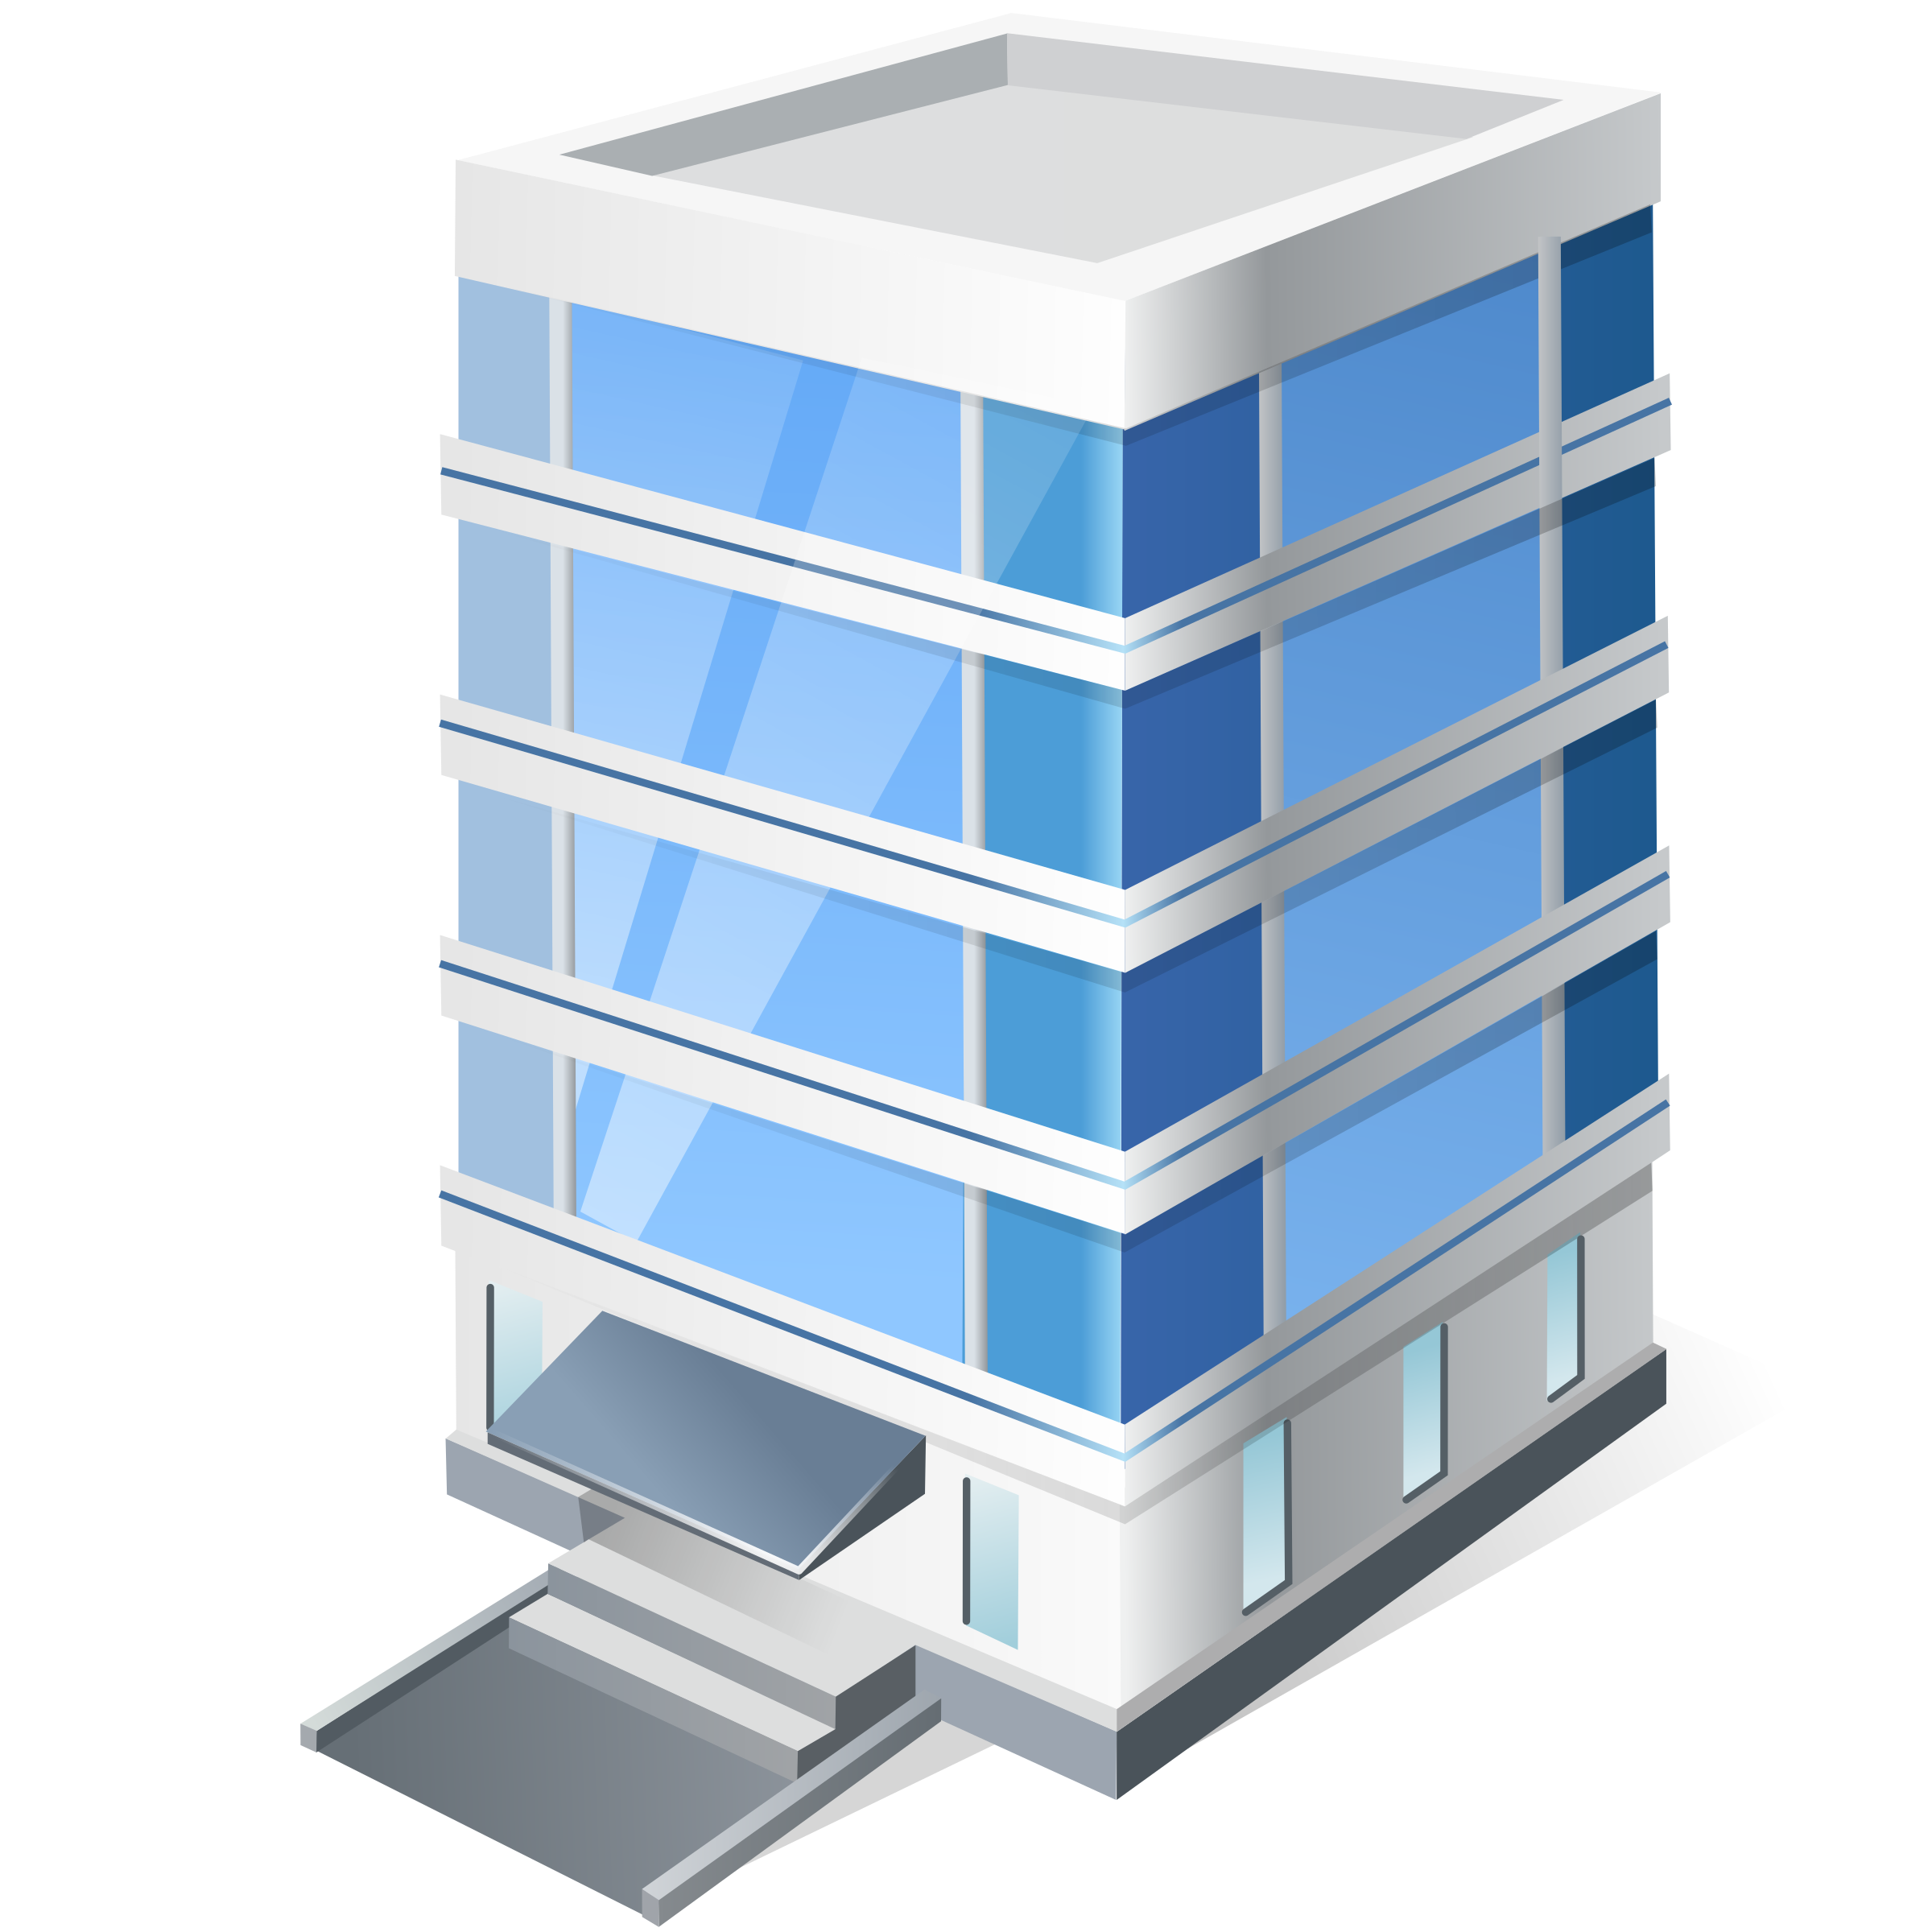 Building Png Image Office Building Web Development Design Building